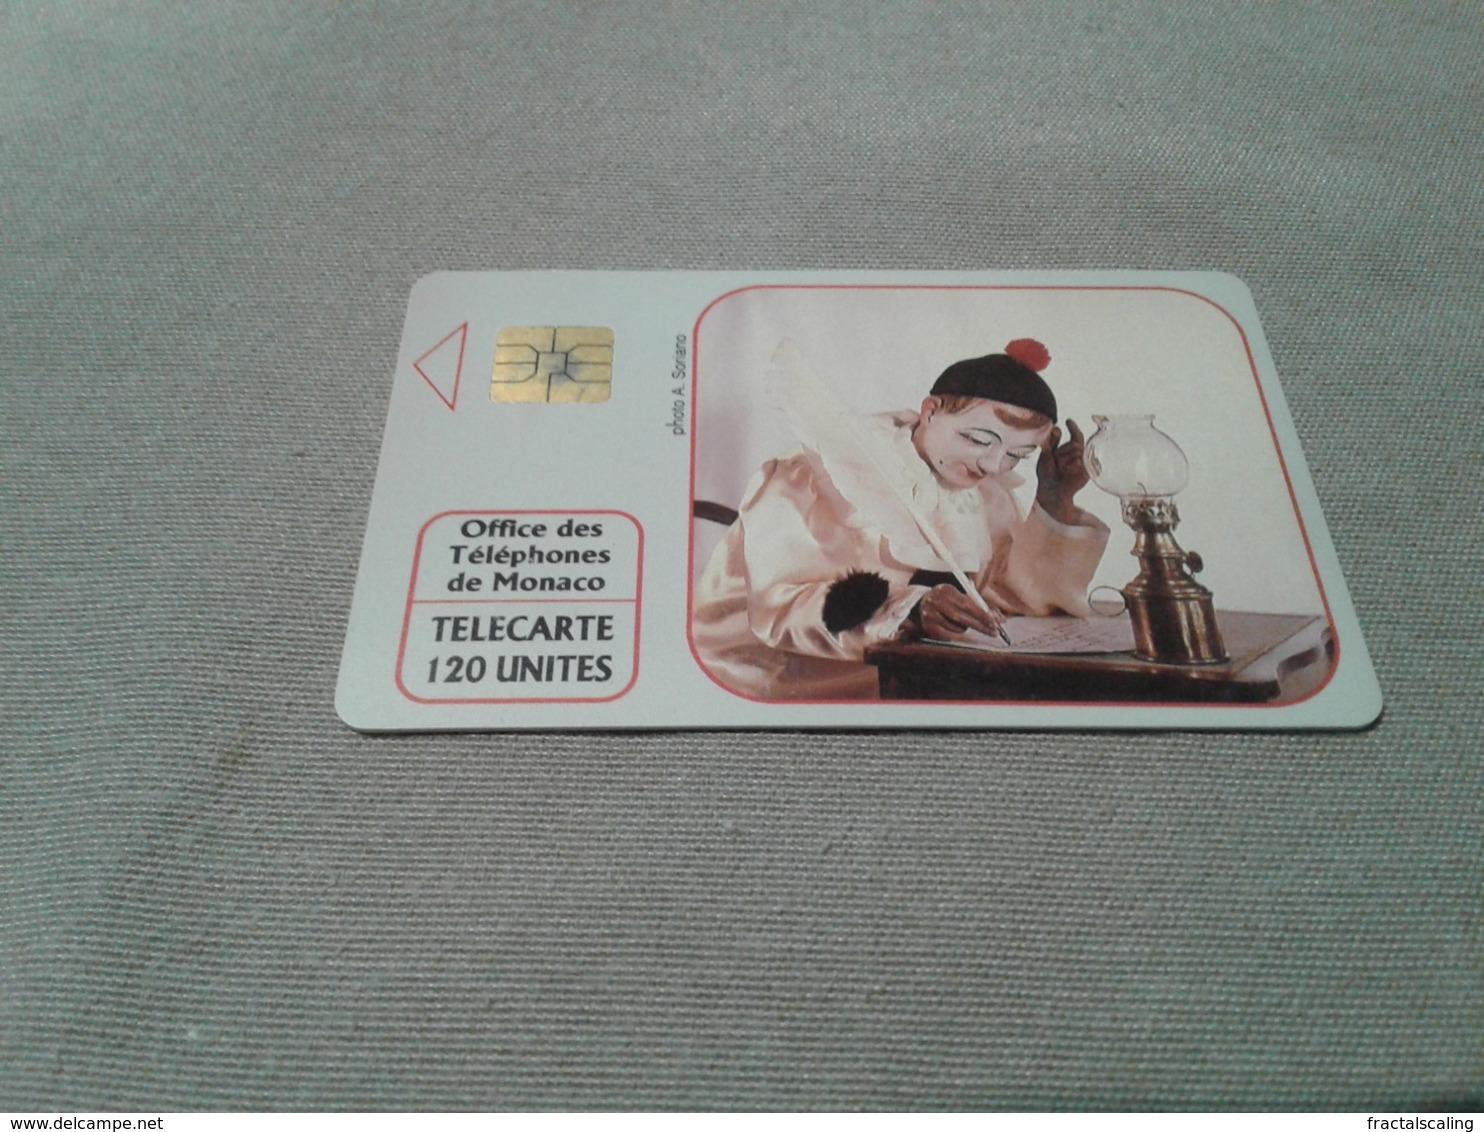 Monaco- Nice Phonecard - Monaco